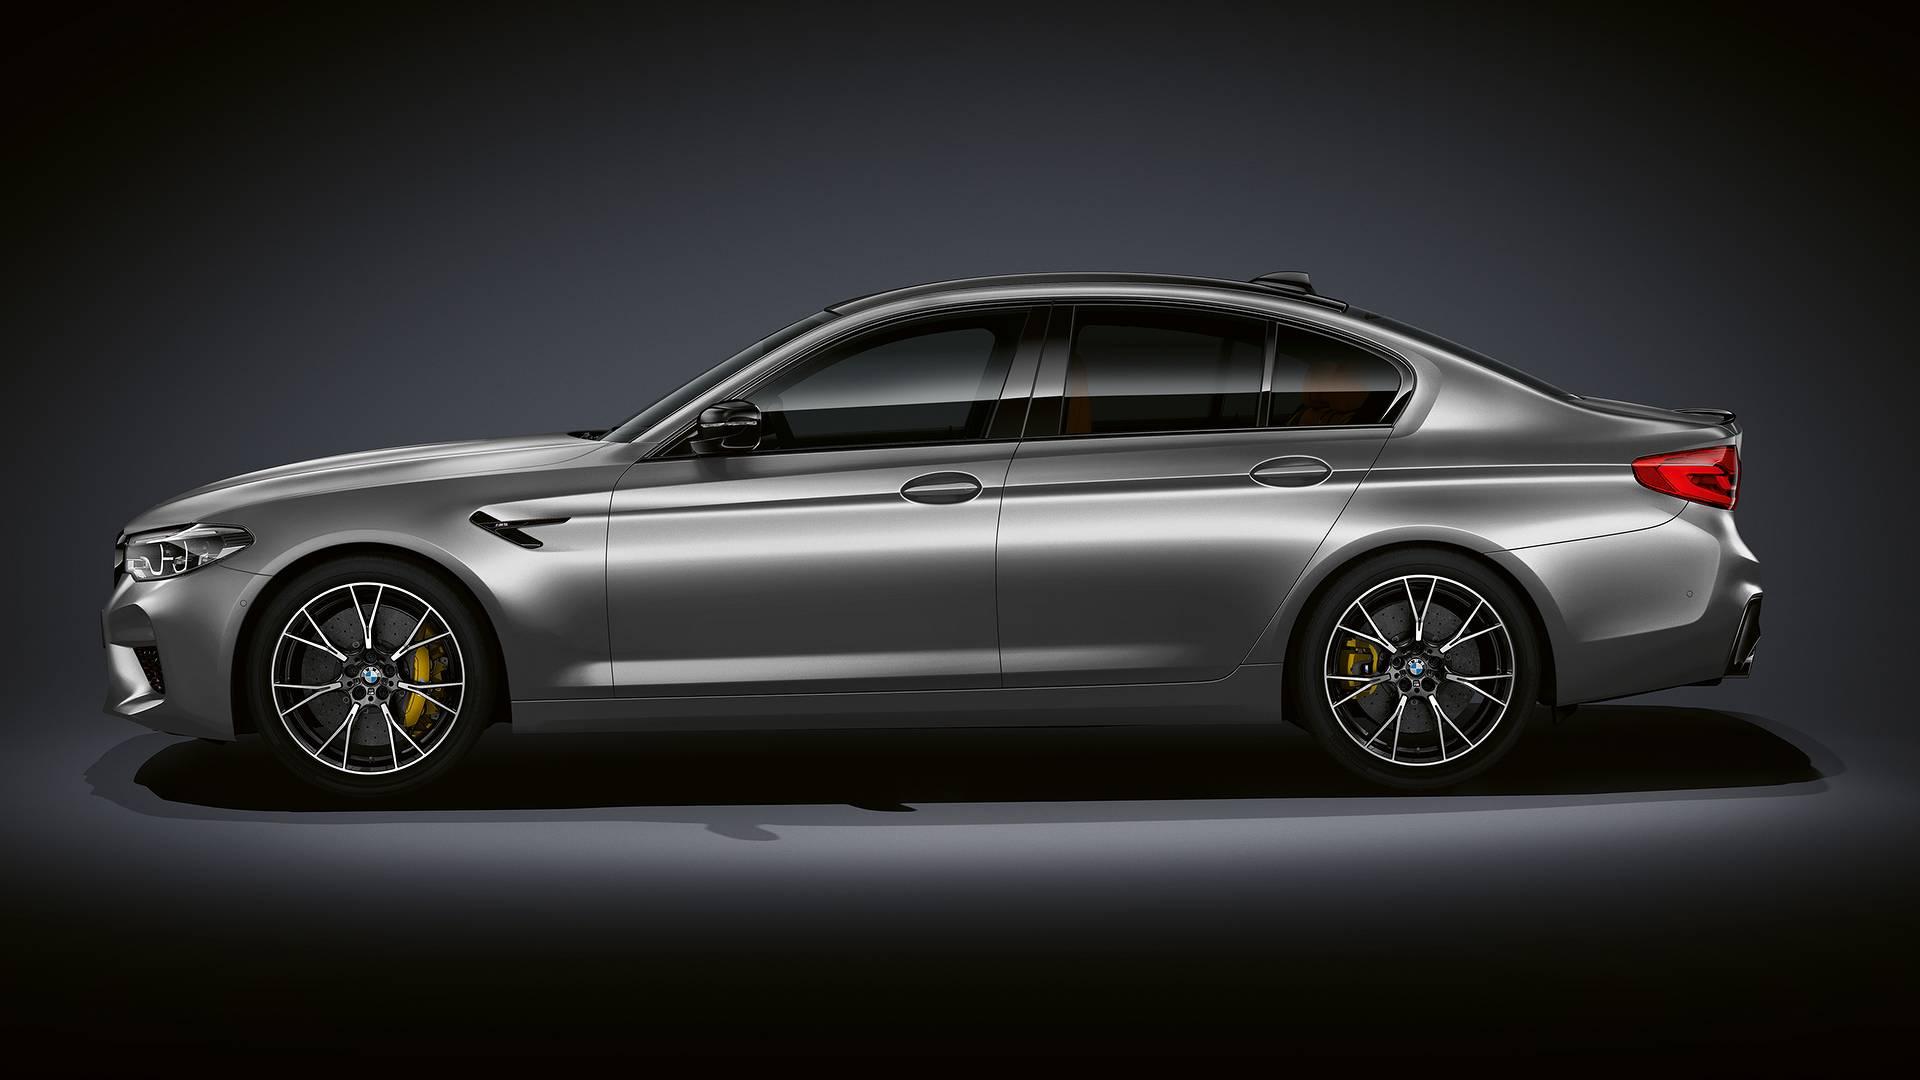 2018 Bmw M5 F90 Recalled Over Ecu Problem Autoevolution